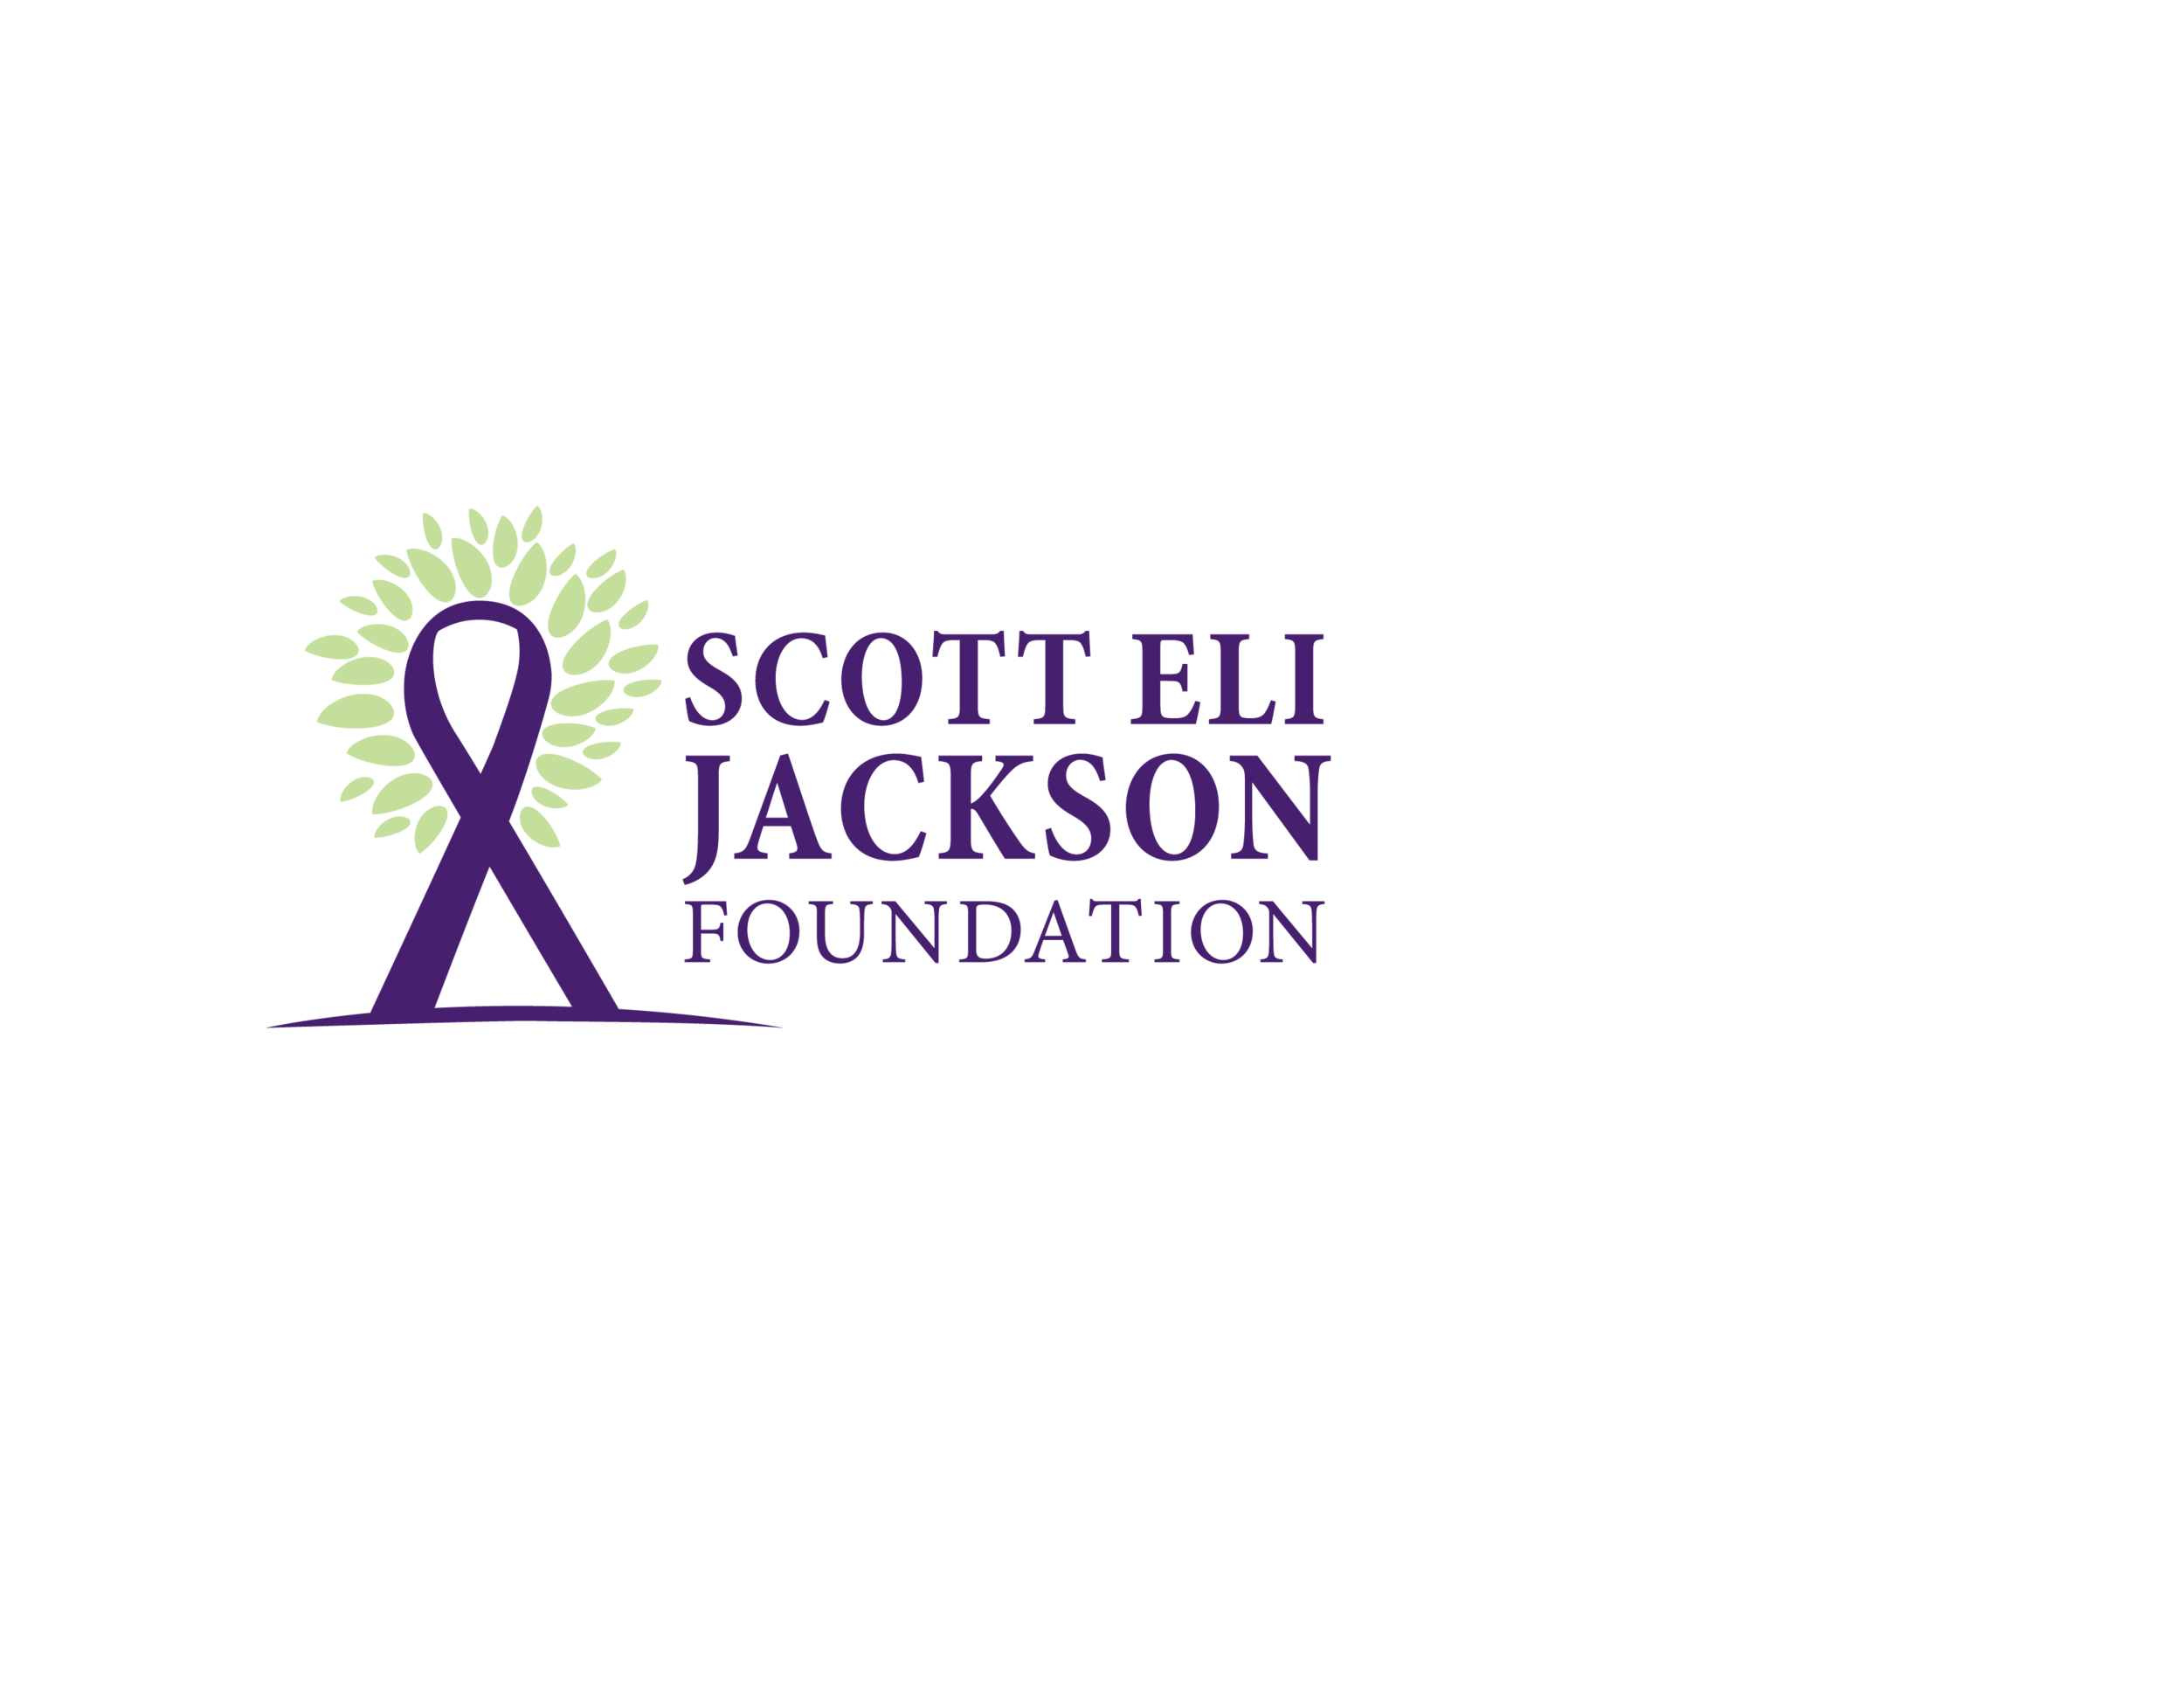 Scott Eli Jackson Foundation.png